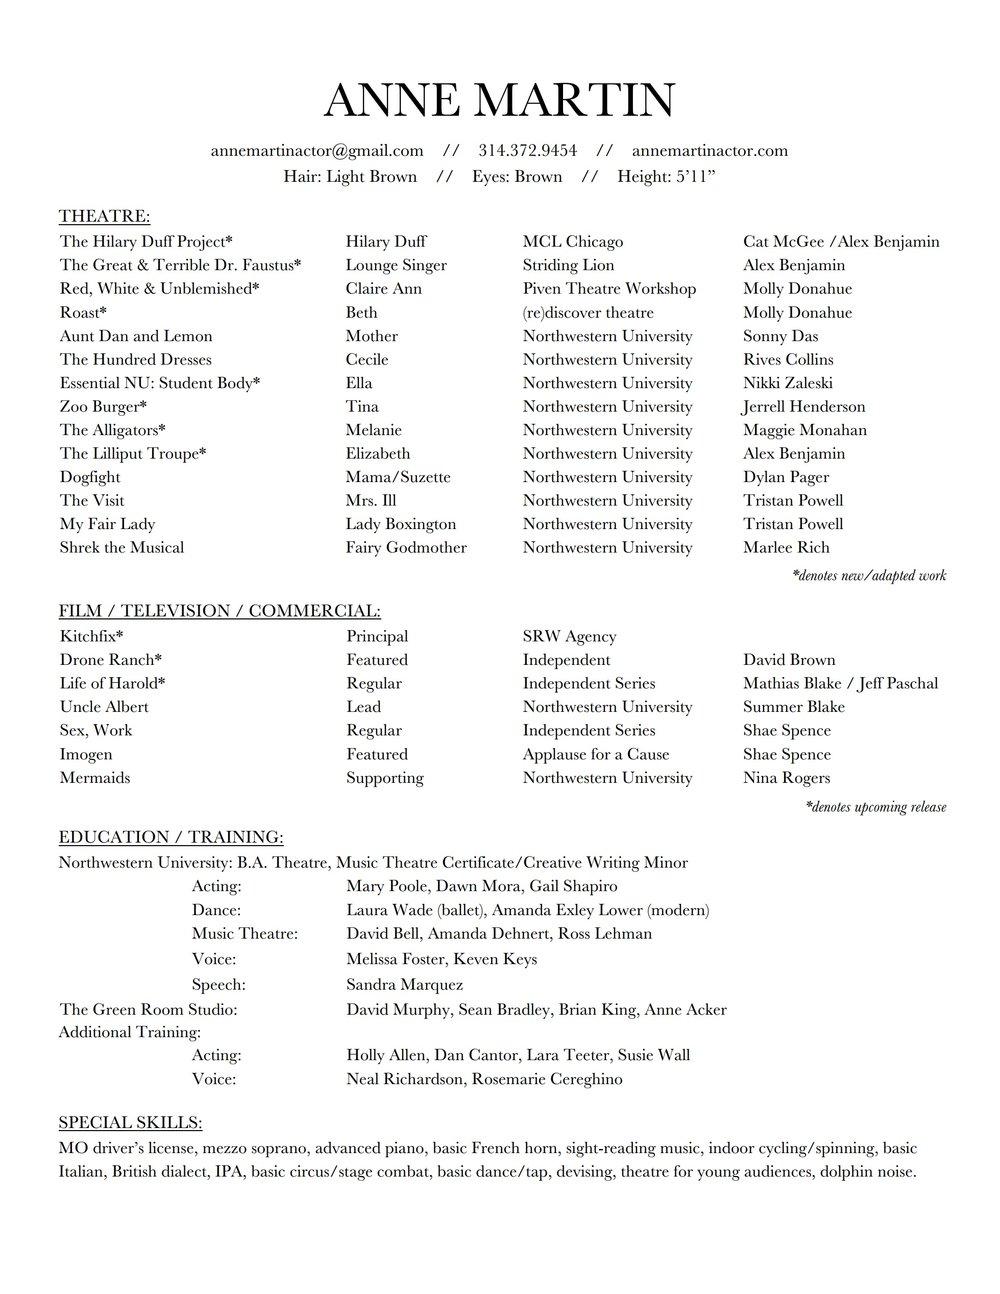 Resume — Anne Martin